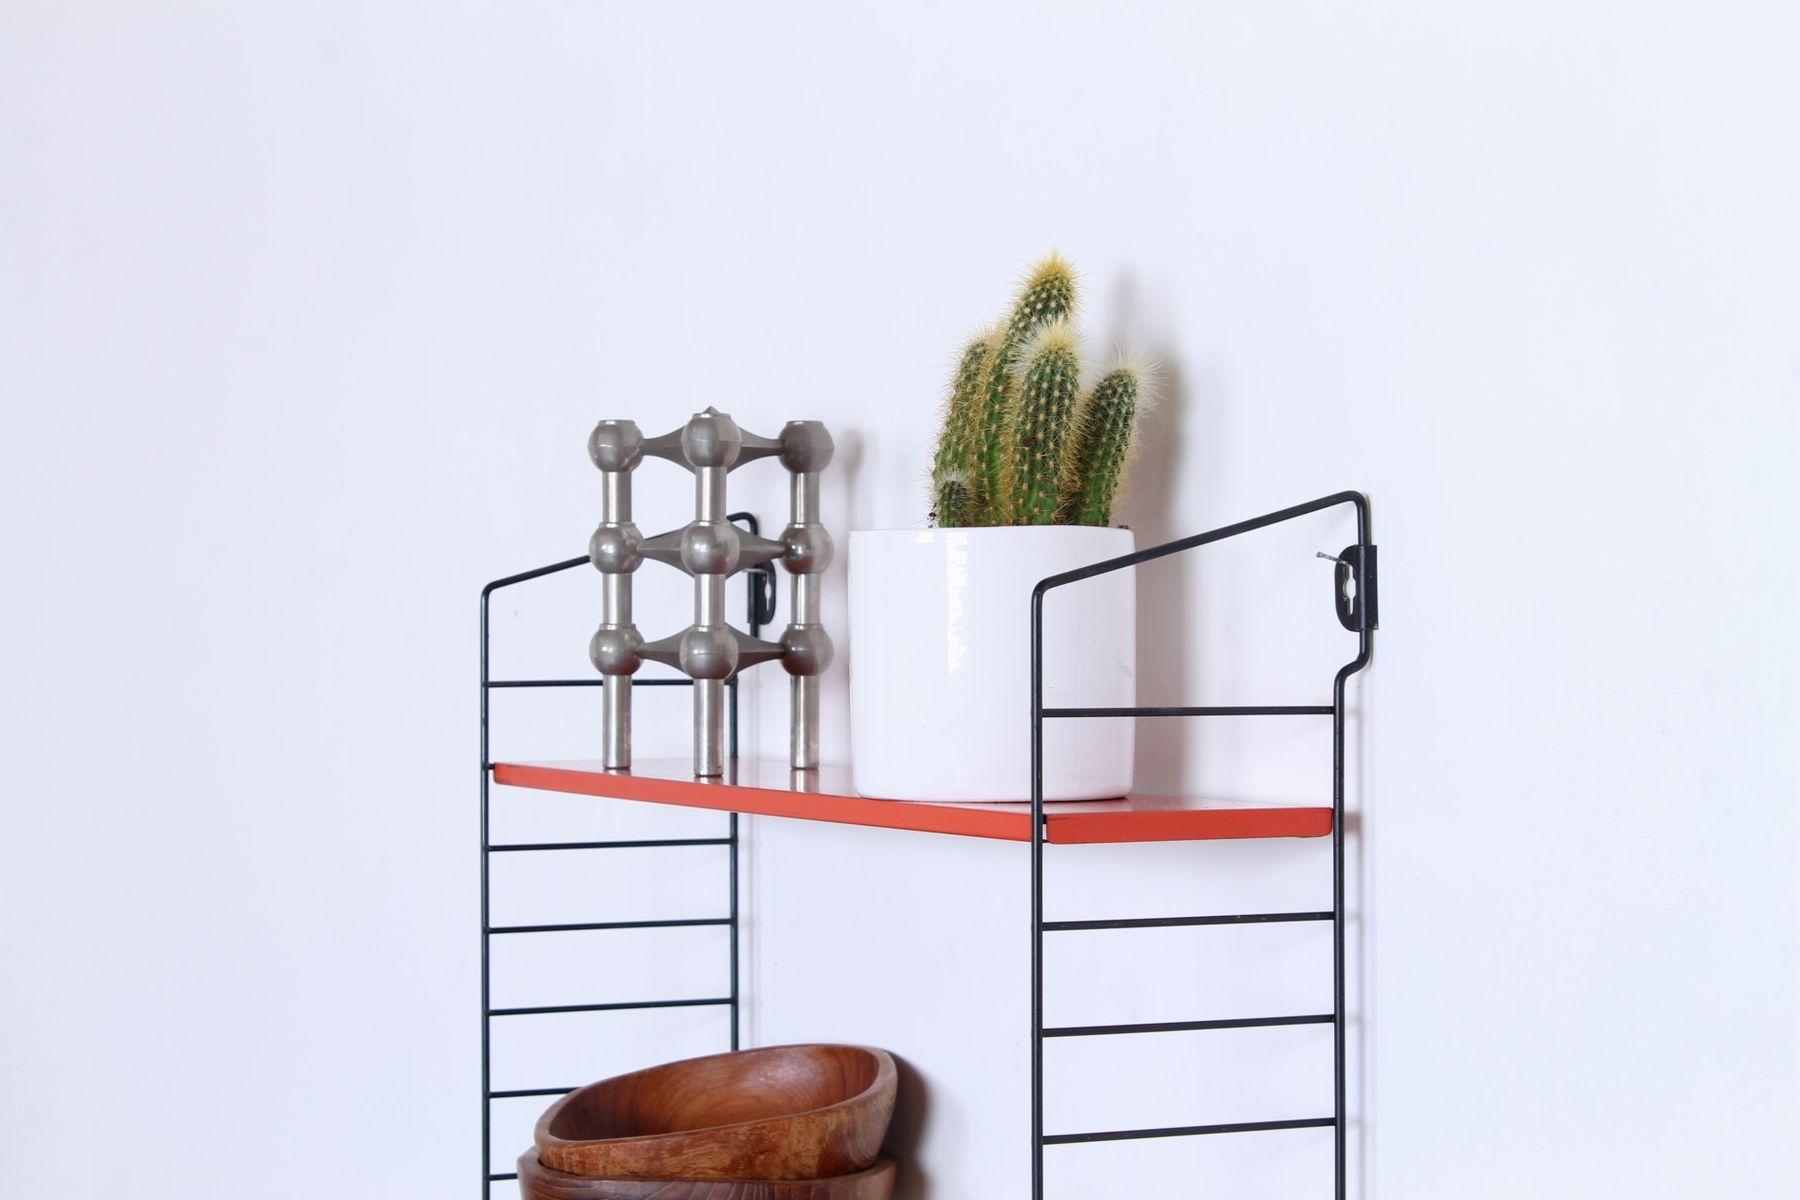 niederl ndisches vintage mini pocket series wandregal von. Black Bedroom Furniture Sets. Home Design Ideas